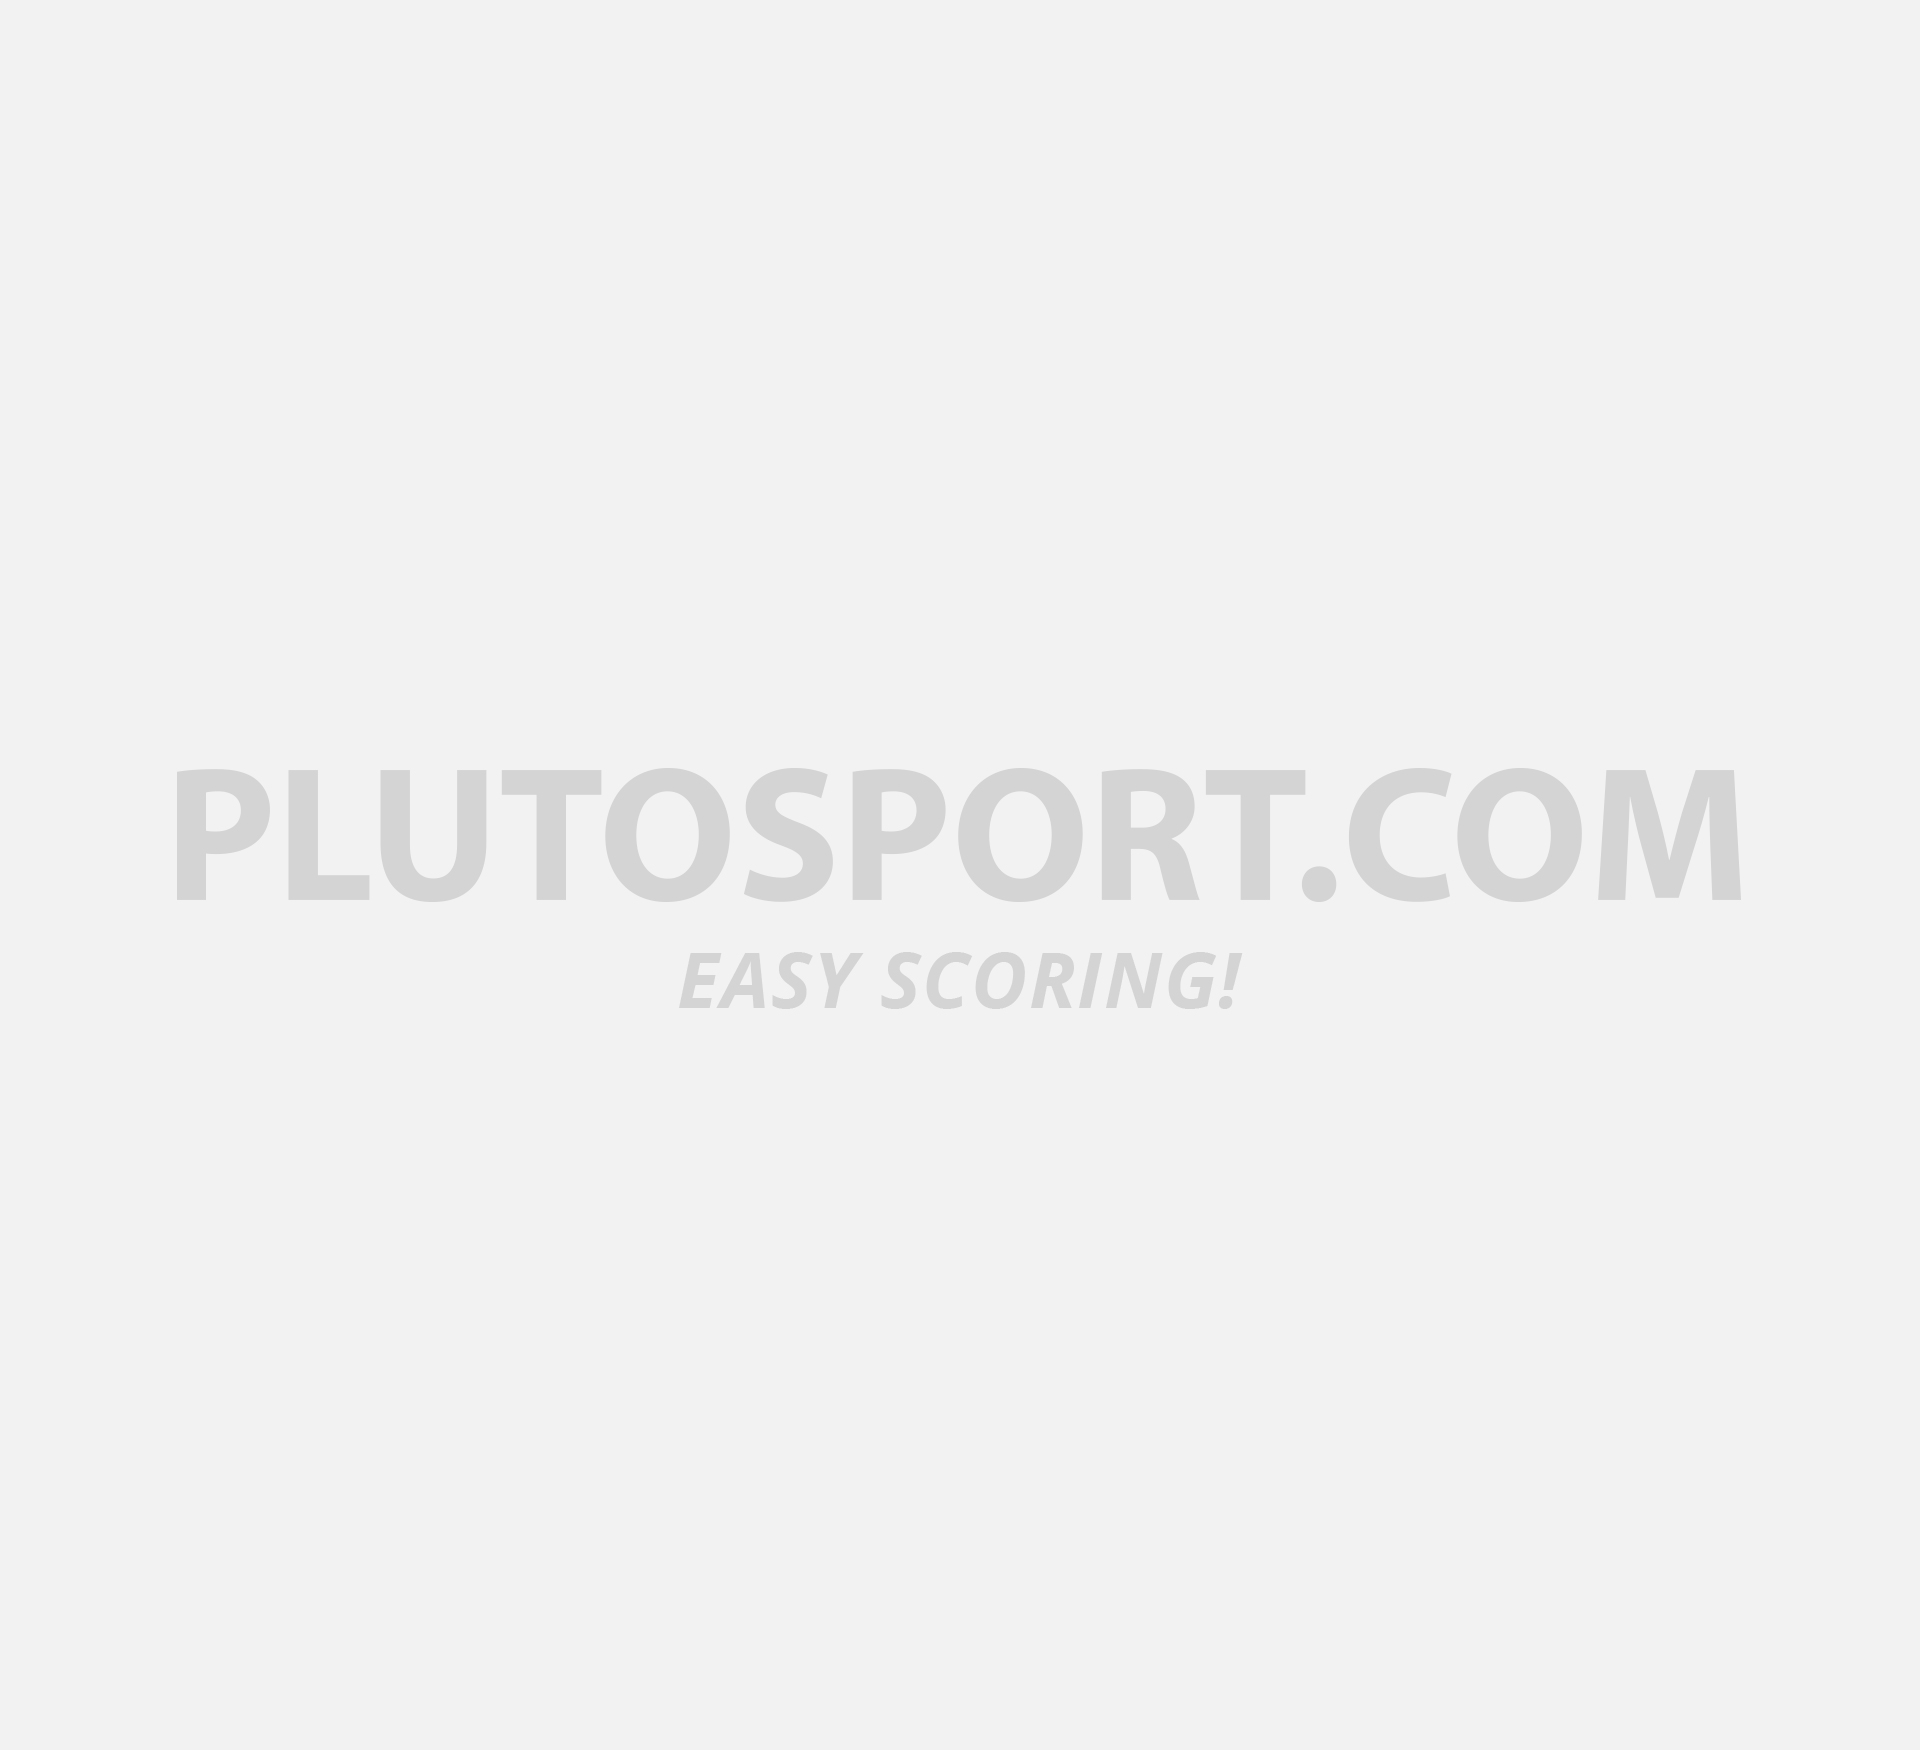 official photos 349a6 91f6f Nike CTR360 Maestri II FG Footballshoe Men - Boots fixed stud - Shoes -  Football - Sports  Plutosport